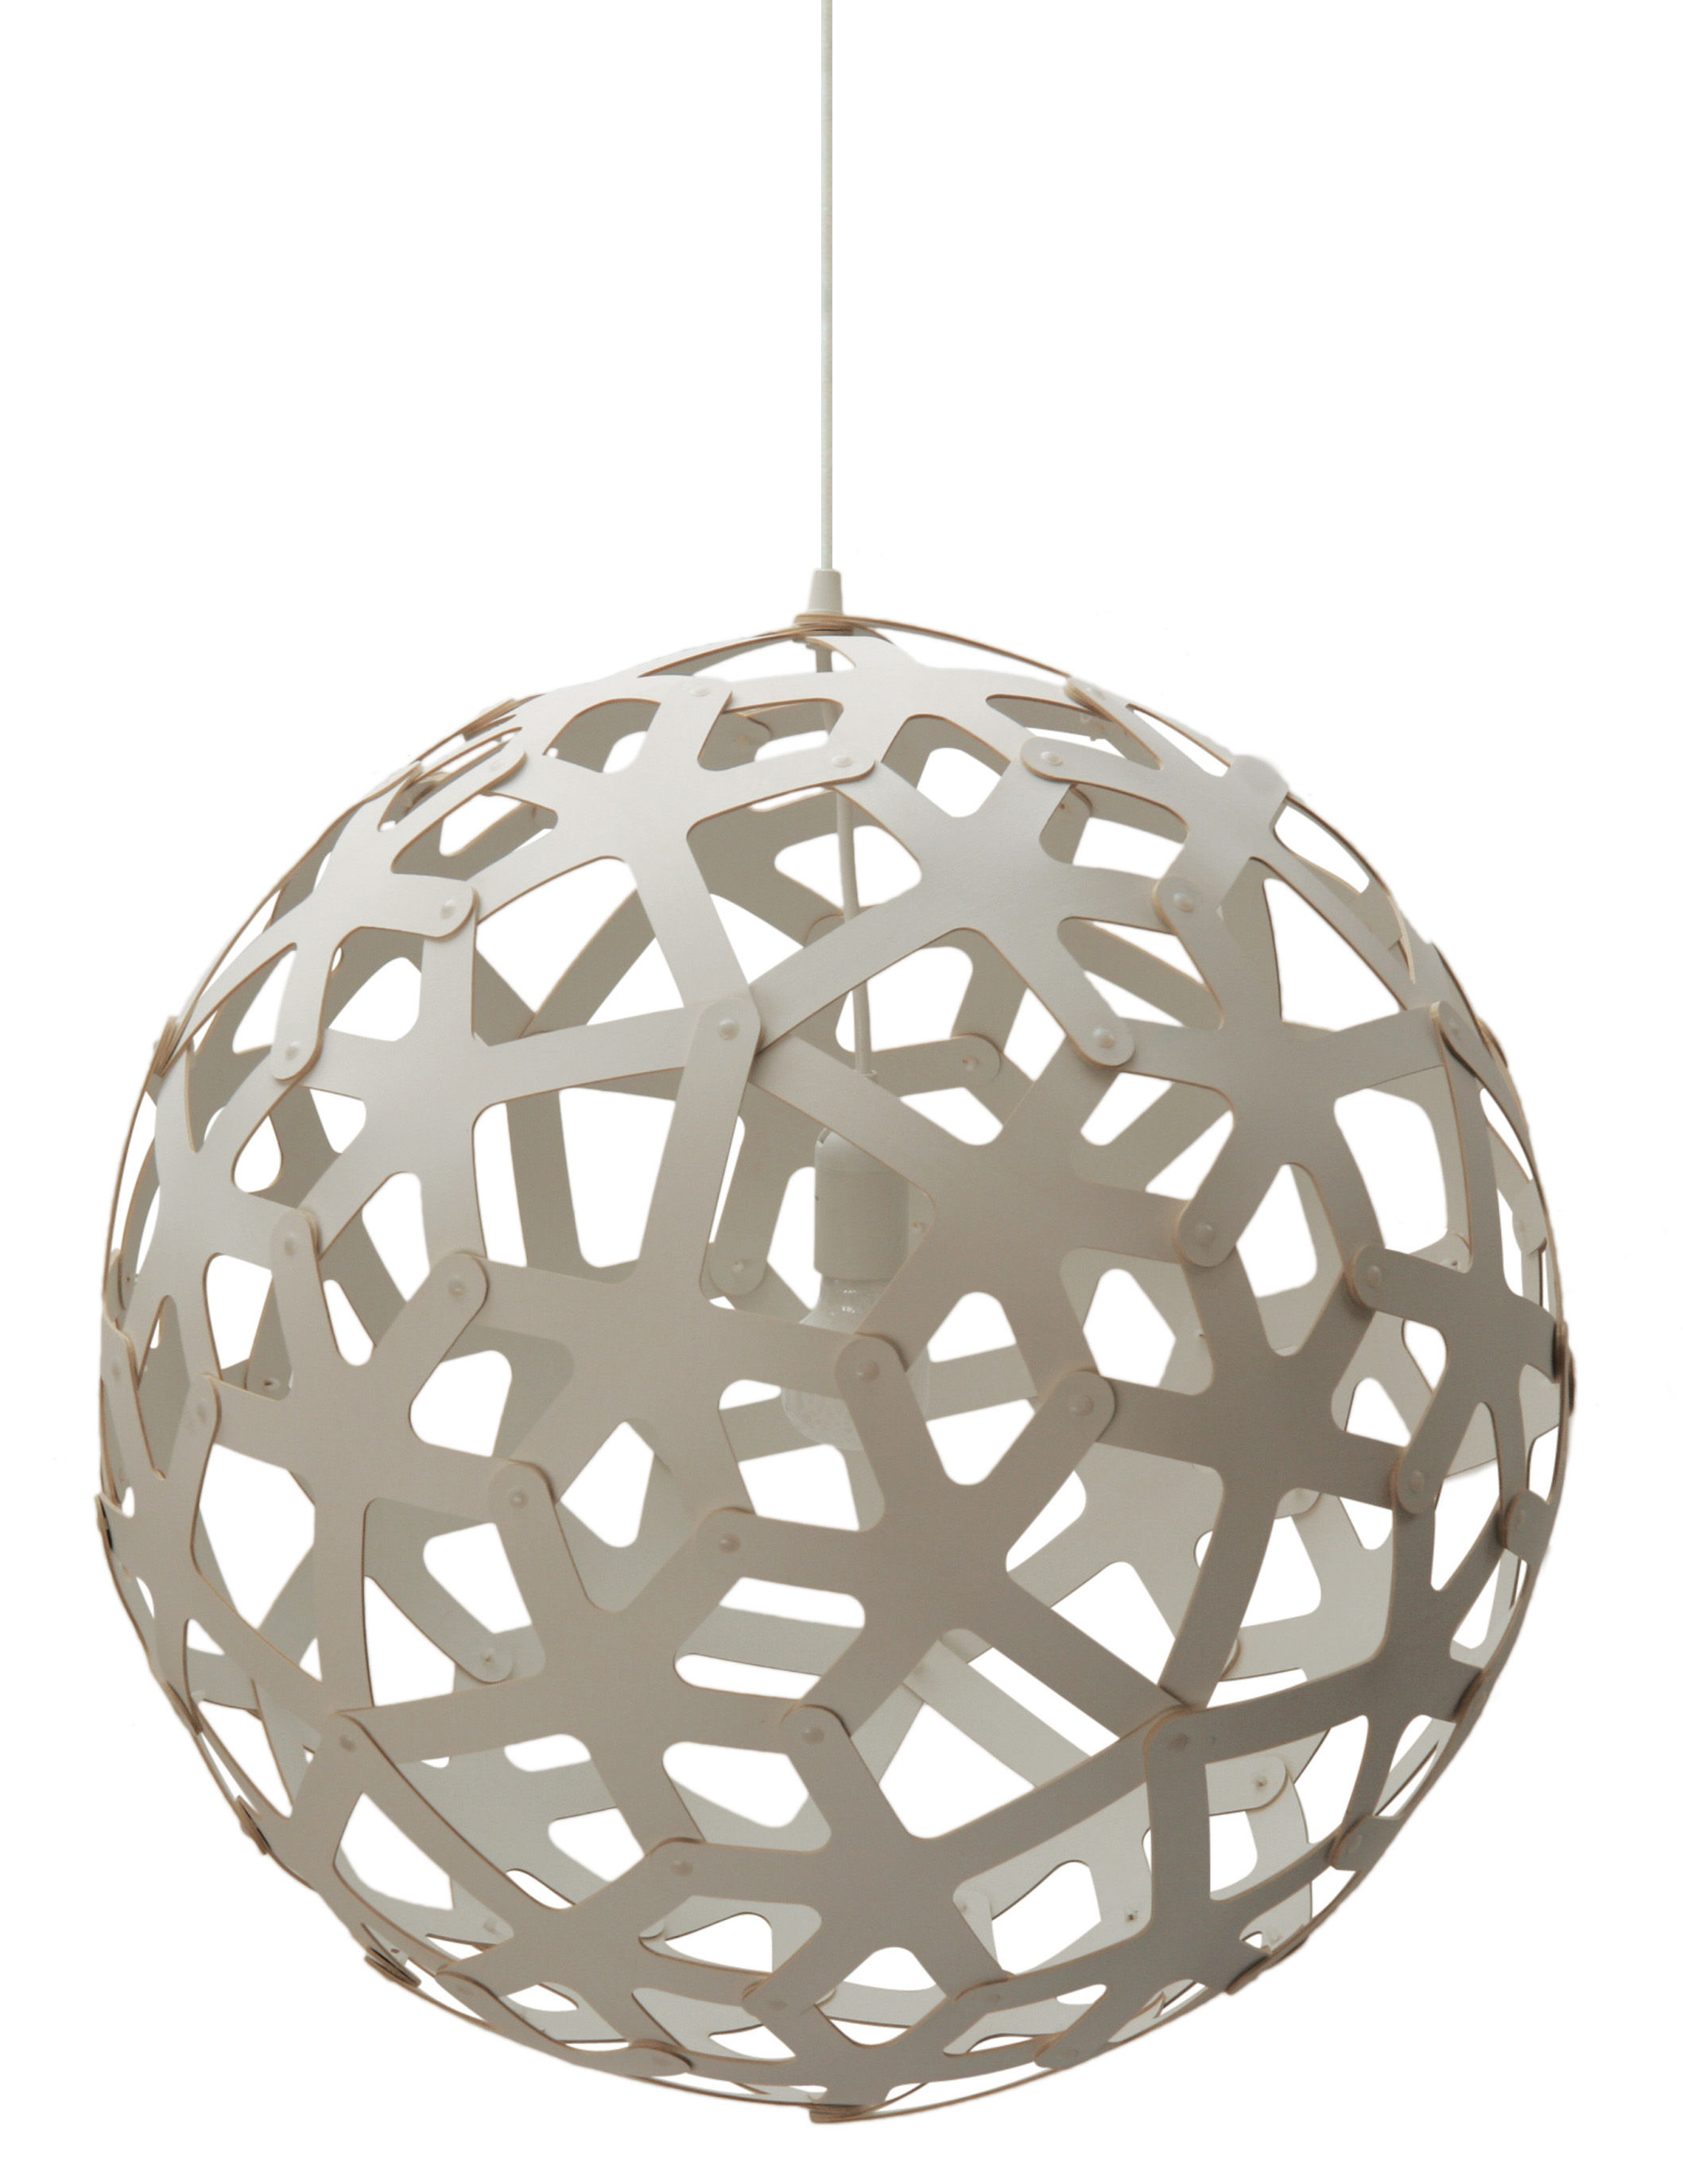 Lighting - Pendant Lighting - Coral Pendant - / Ø 60 cm - White by David Trubridge - White - Pine